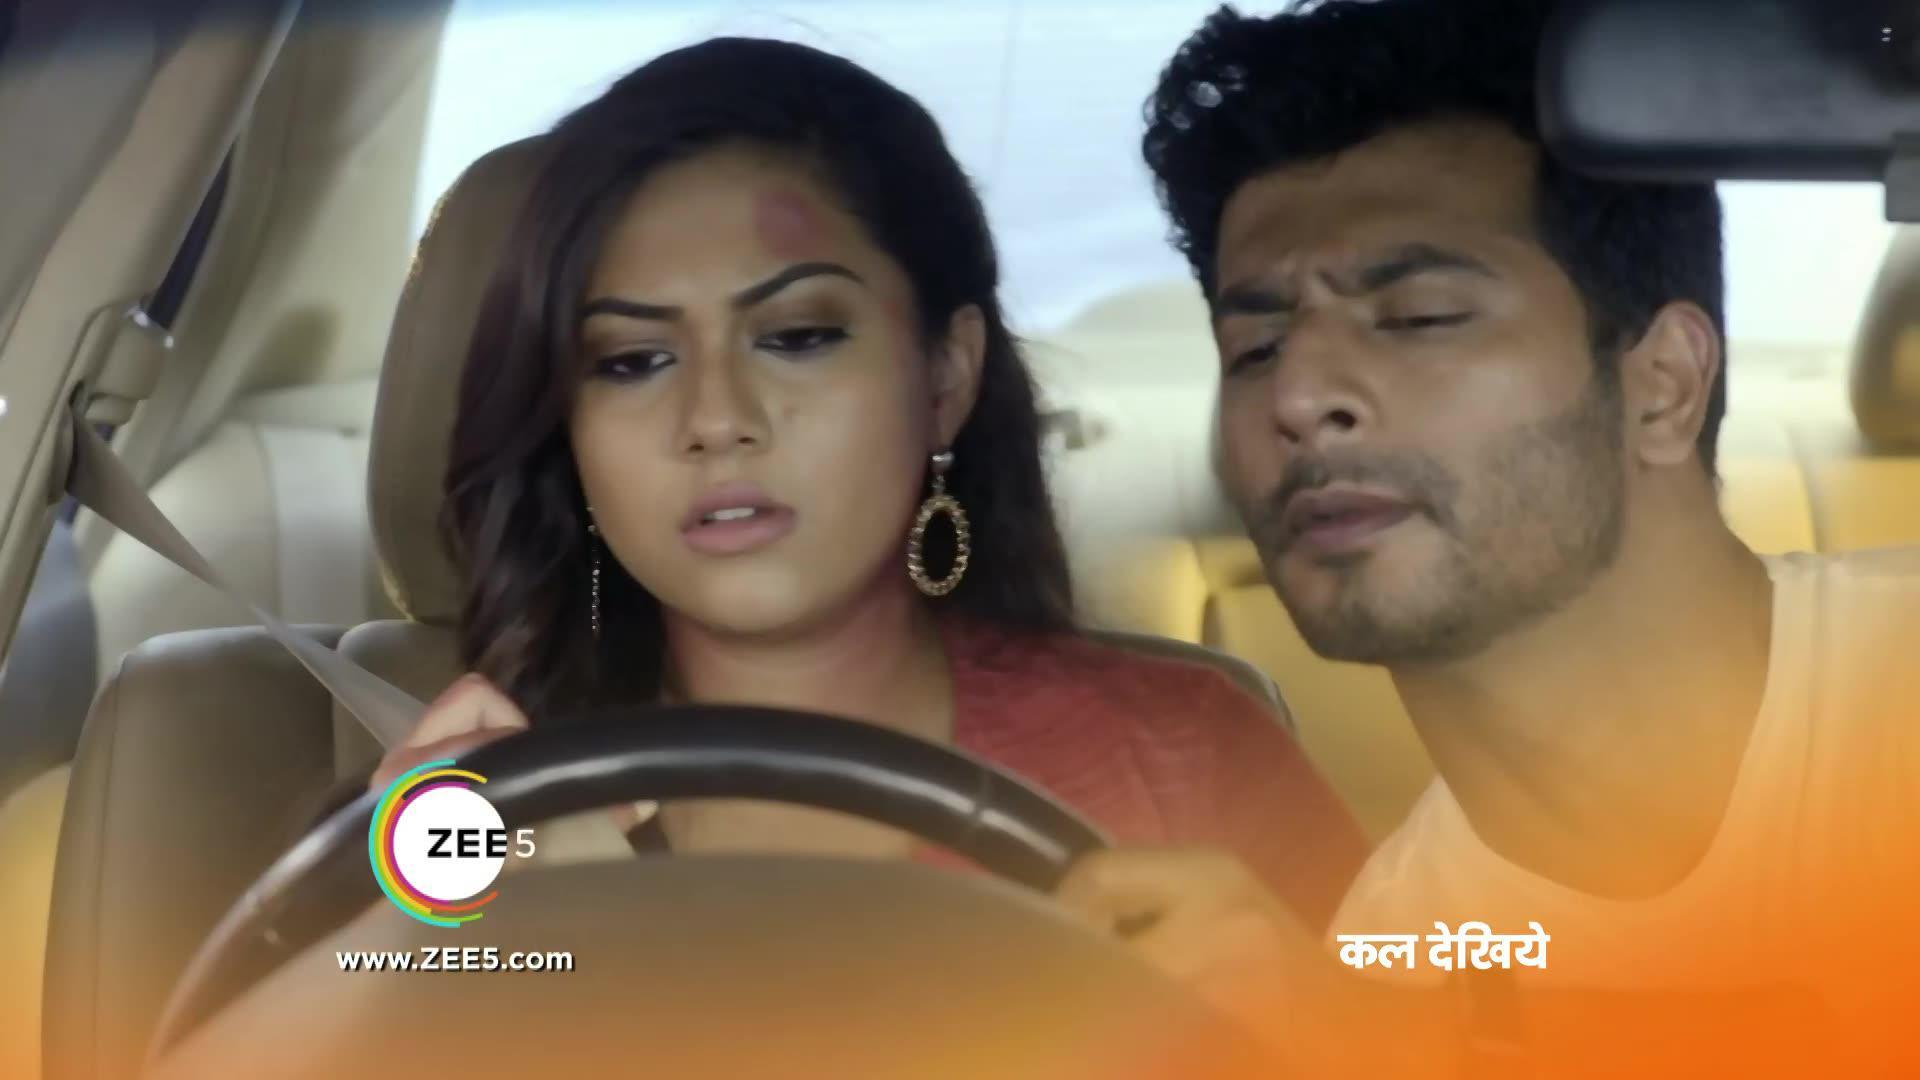 Tujhse Hai Raabta 22 September Spoiler: Vikram Spots Kalyani And Malhar Together